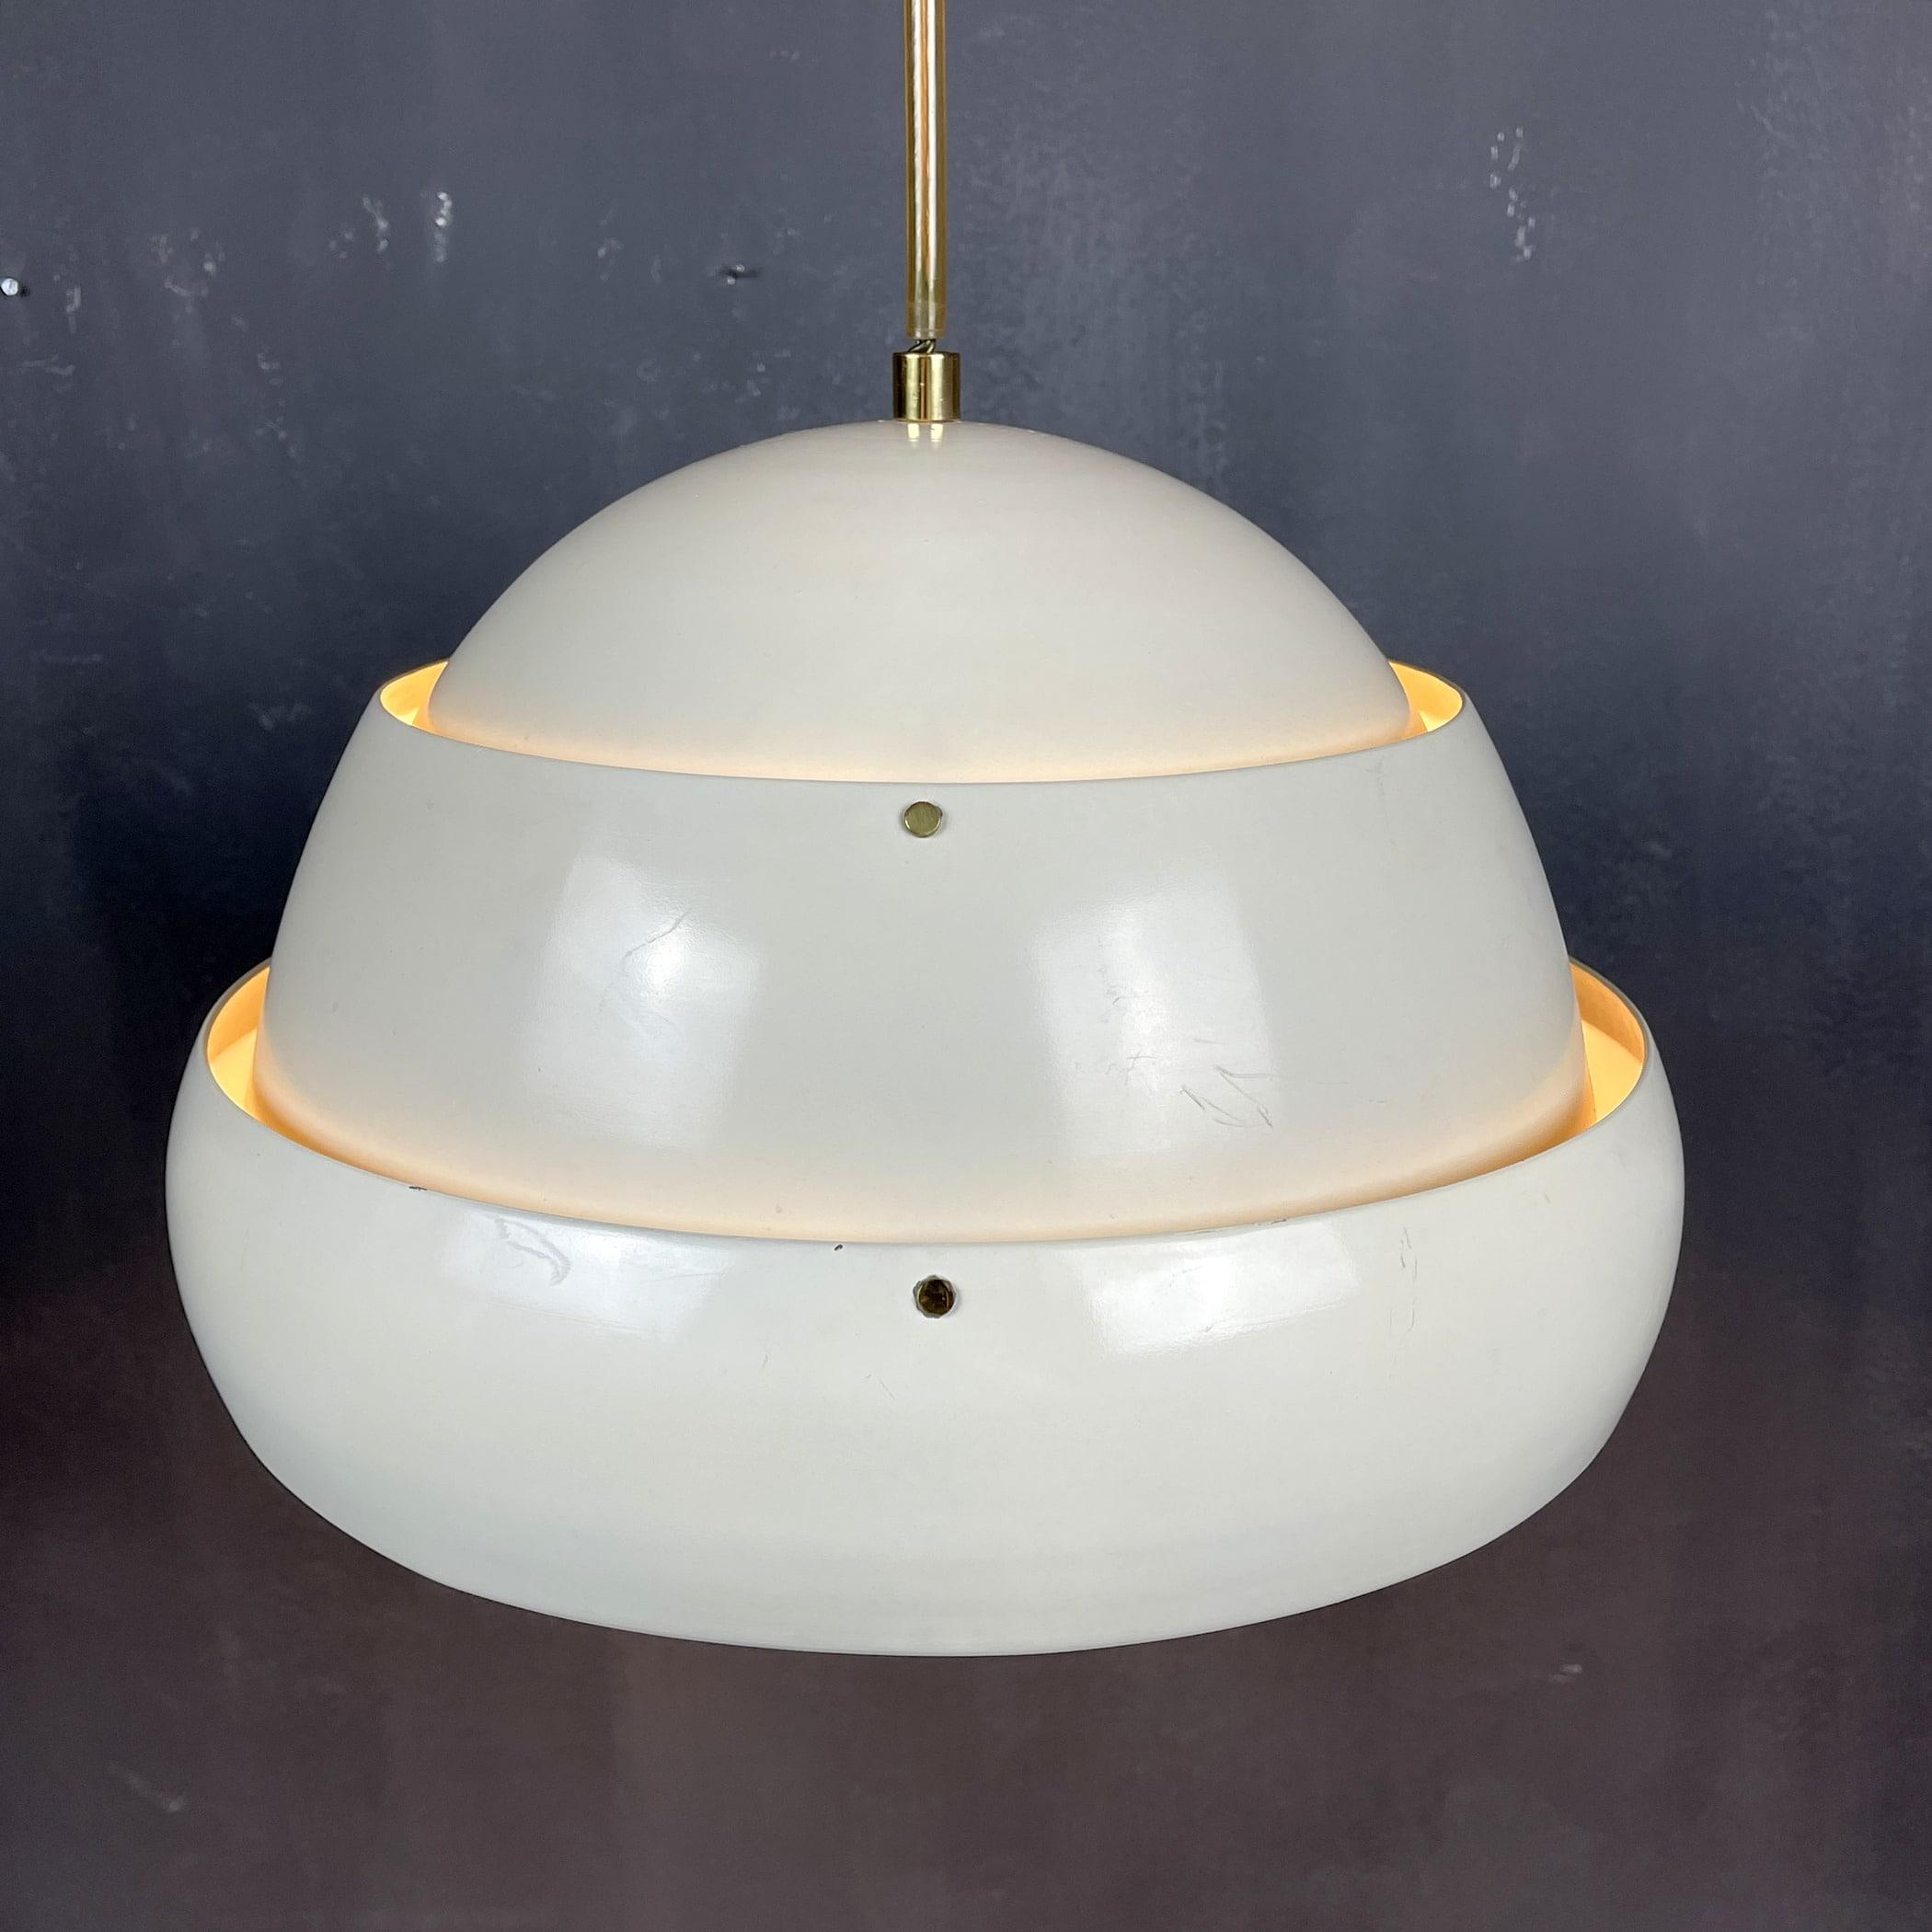 Vintage metal pendant lamp DDR 60s-70s Scandinavian design Retro home decor